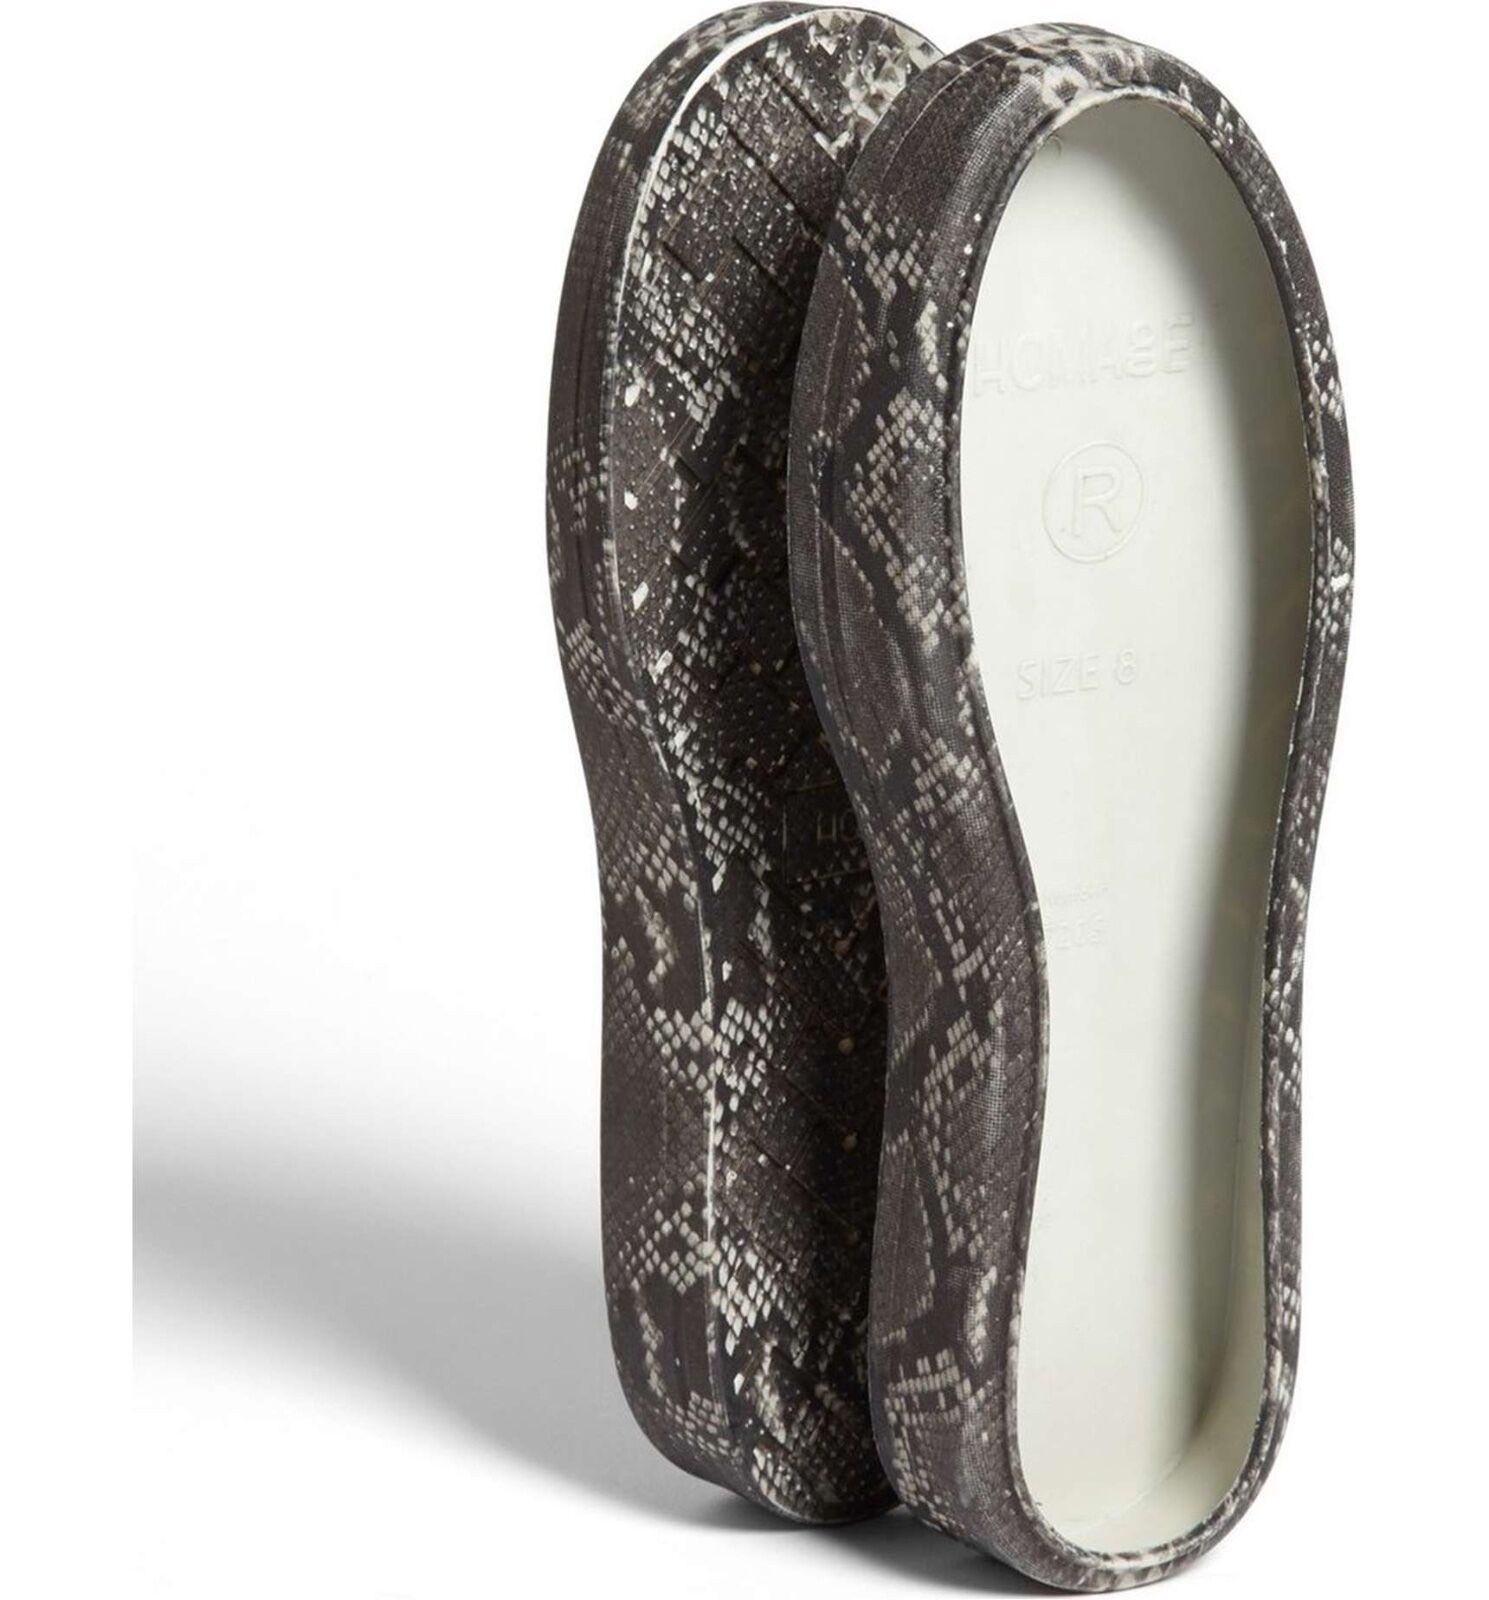 Homage Boot Wrap Snakeskin Print Women's Size 9 M 2144